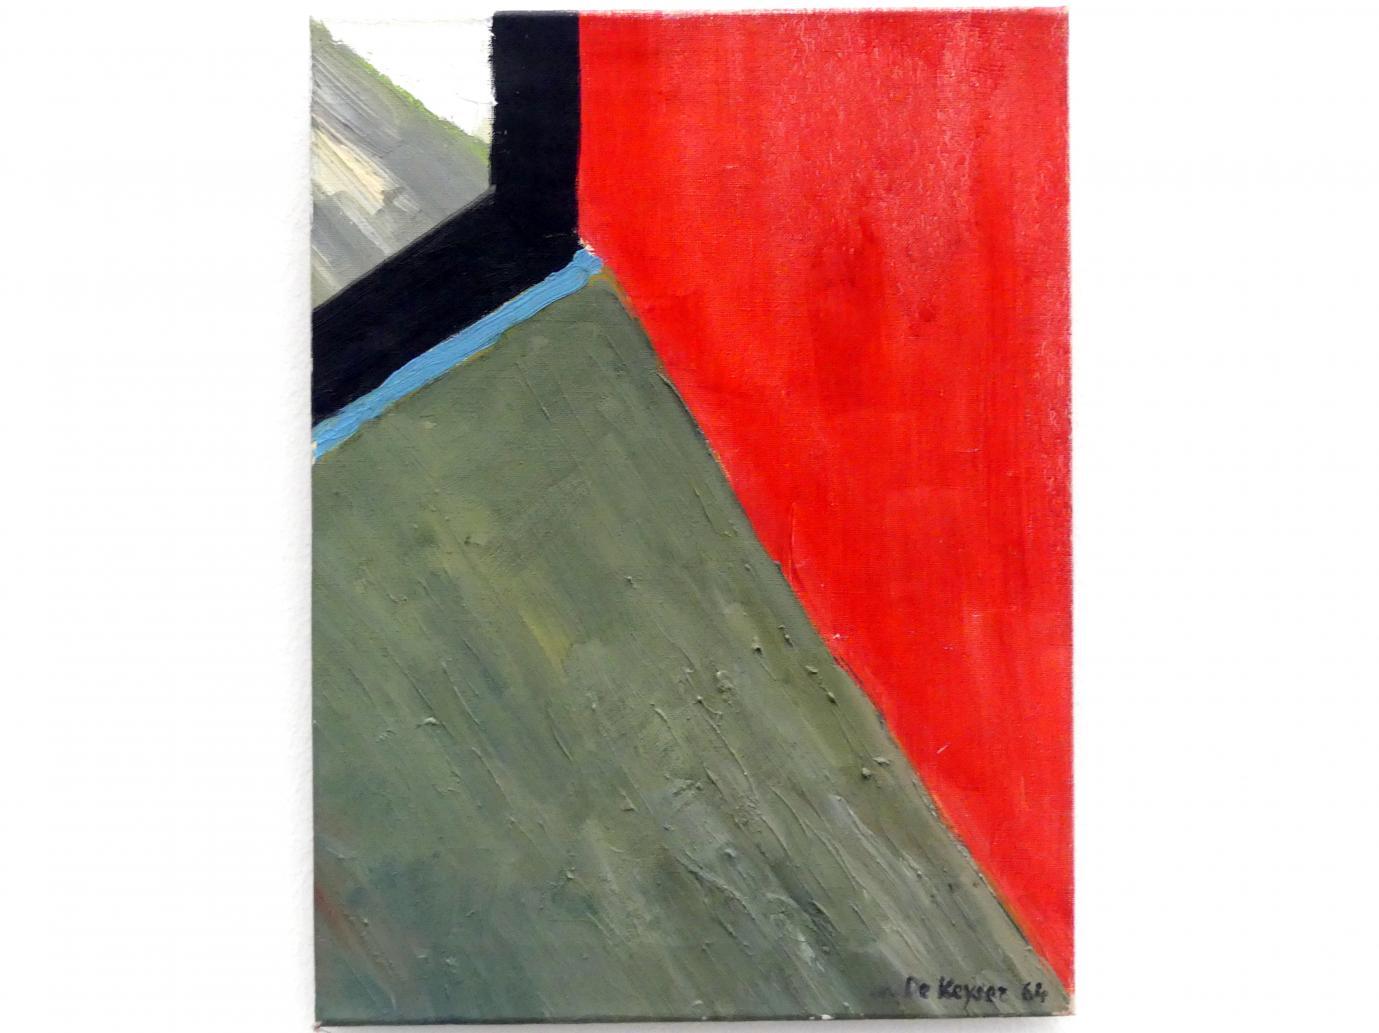 Raoul De Keyser: Hoek - Ecke, 1964